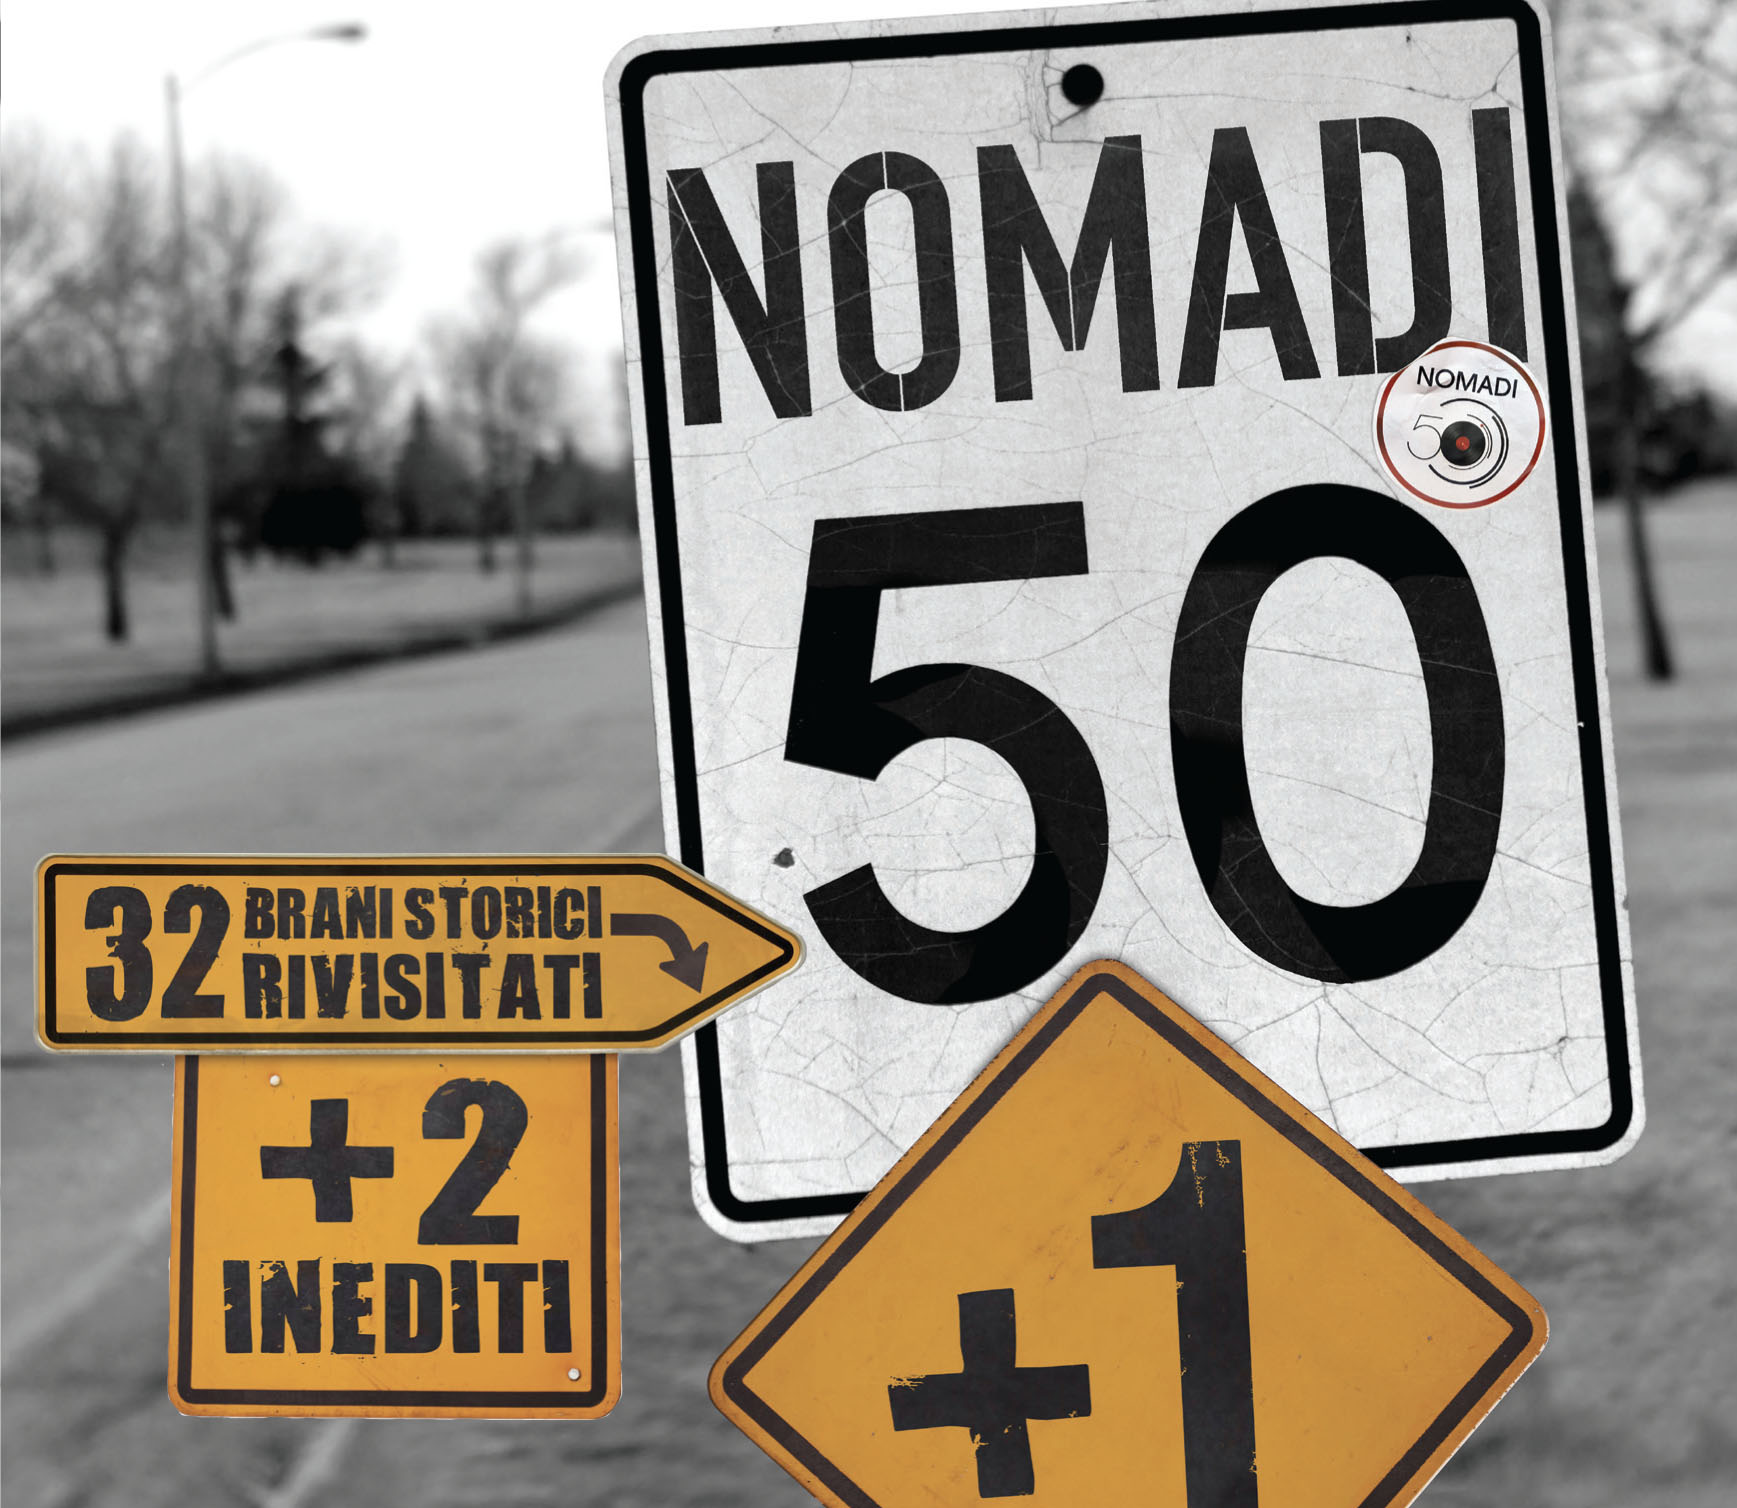 NOMADI: LIVE TOUR TEATRALE 2014